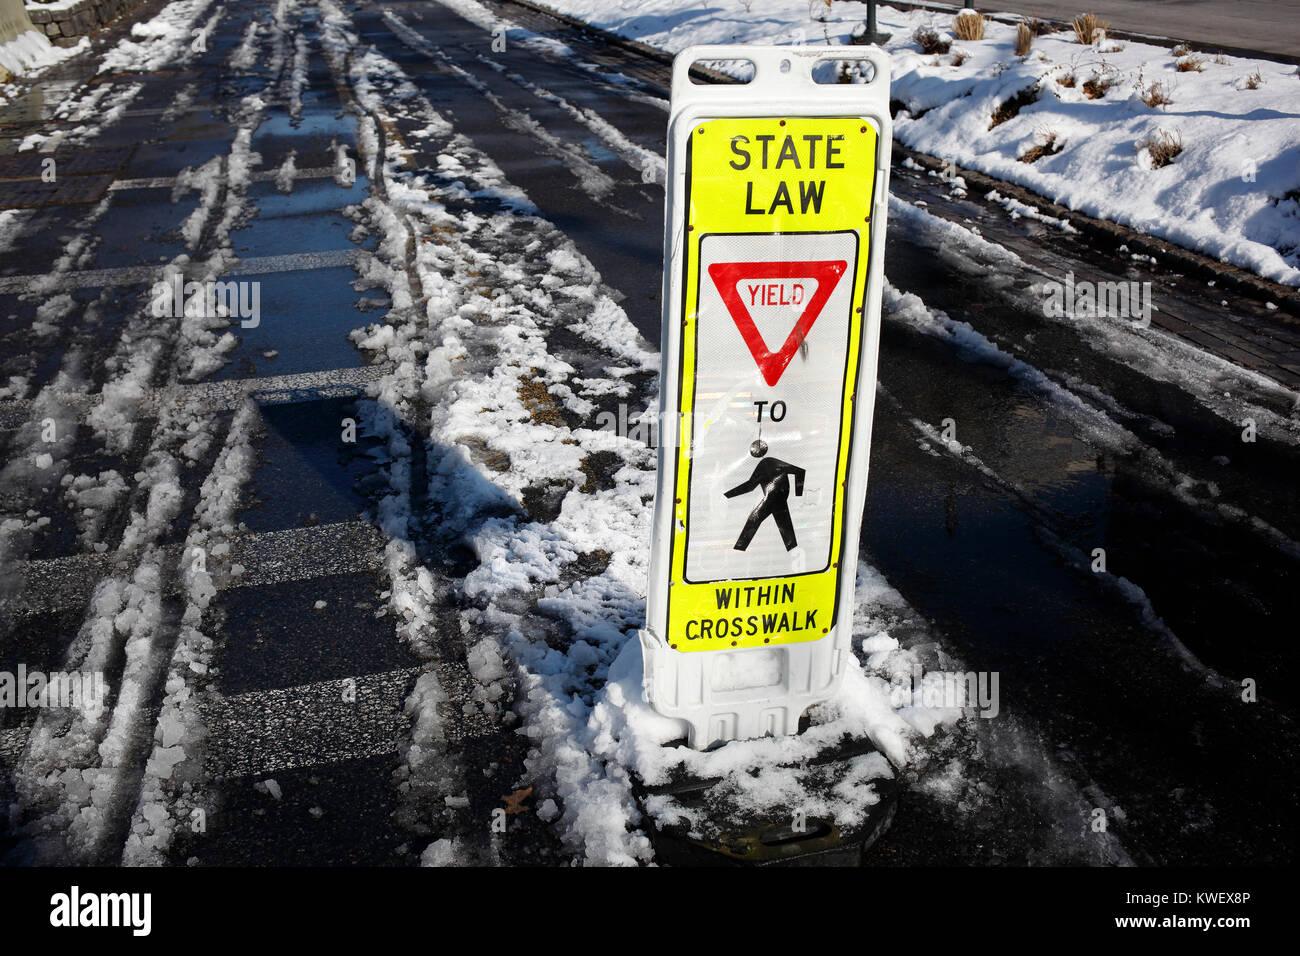 Yield to pedestrians in crosswalk sign on slushy bike lane in Hudson River Park, New York City - Stock Image